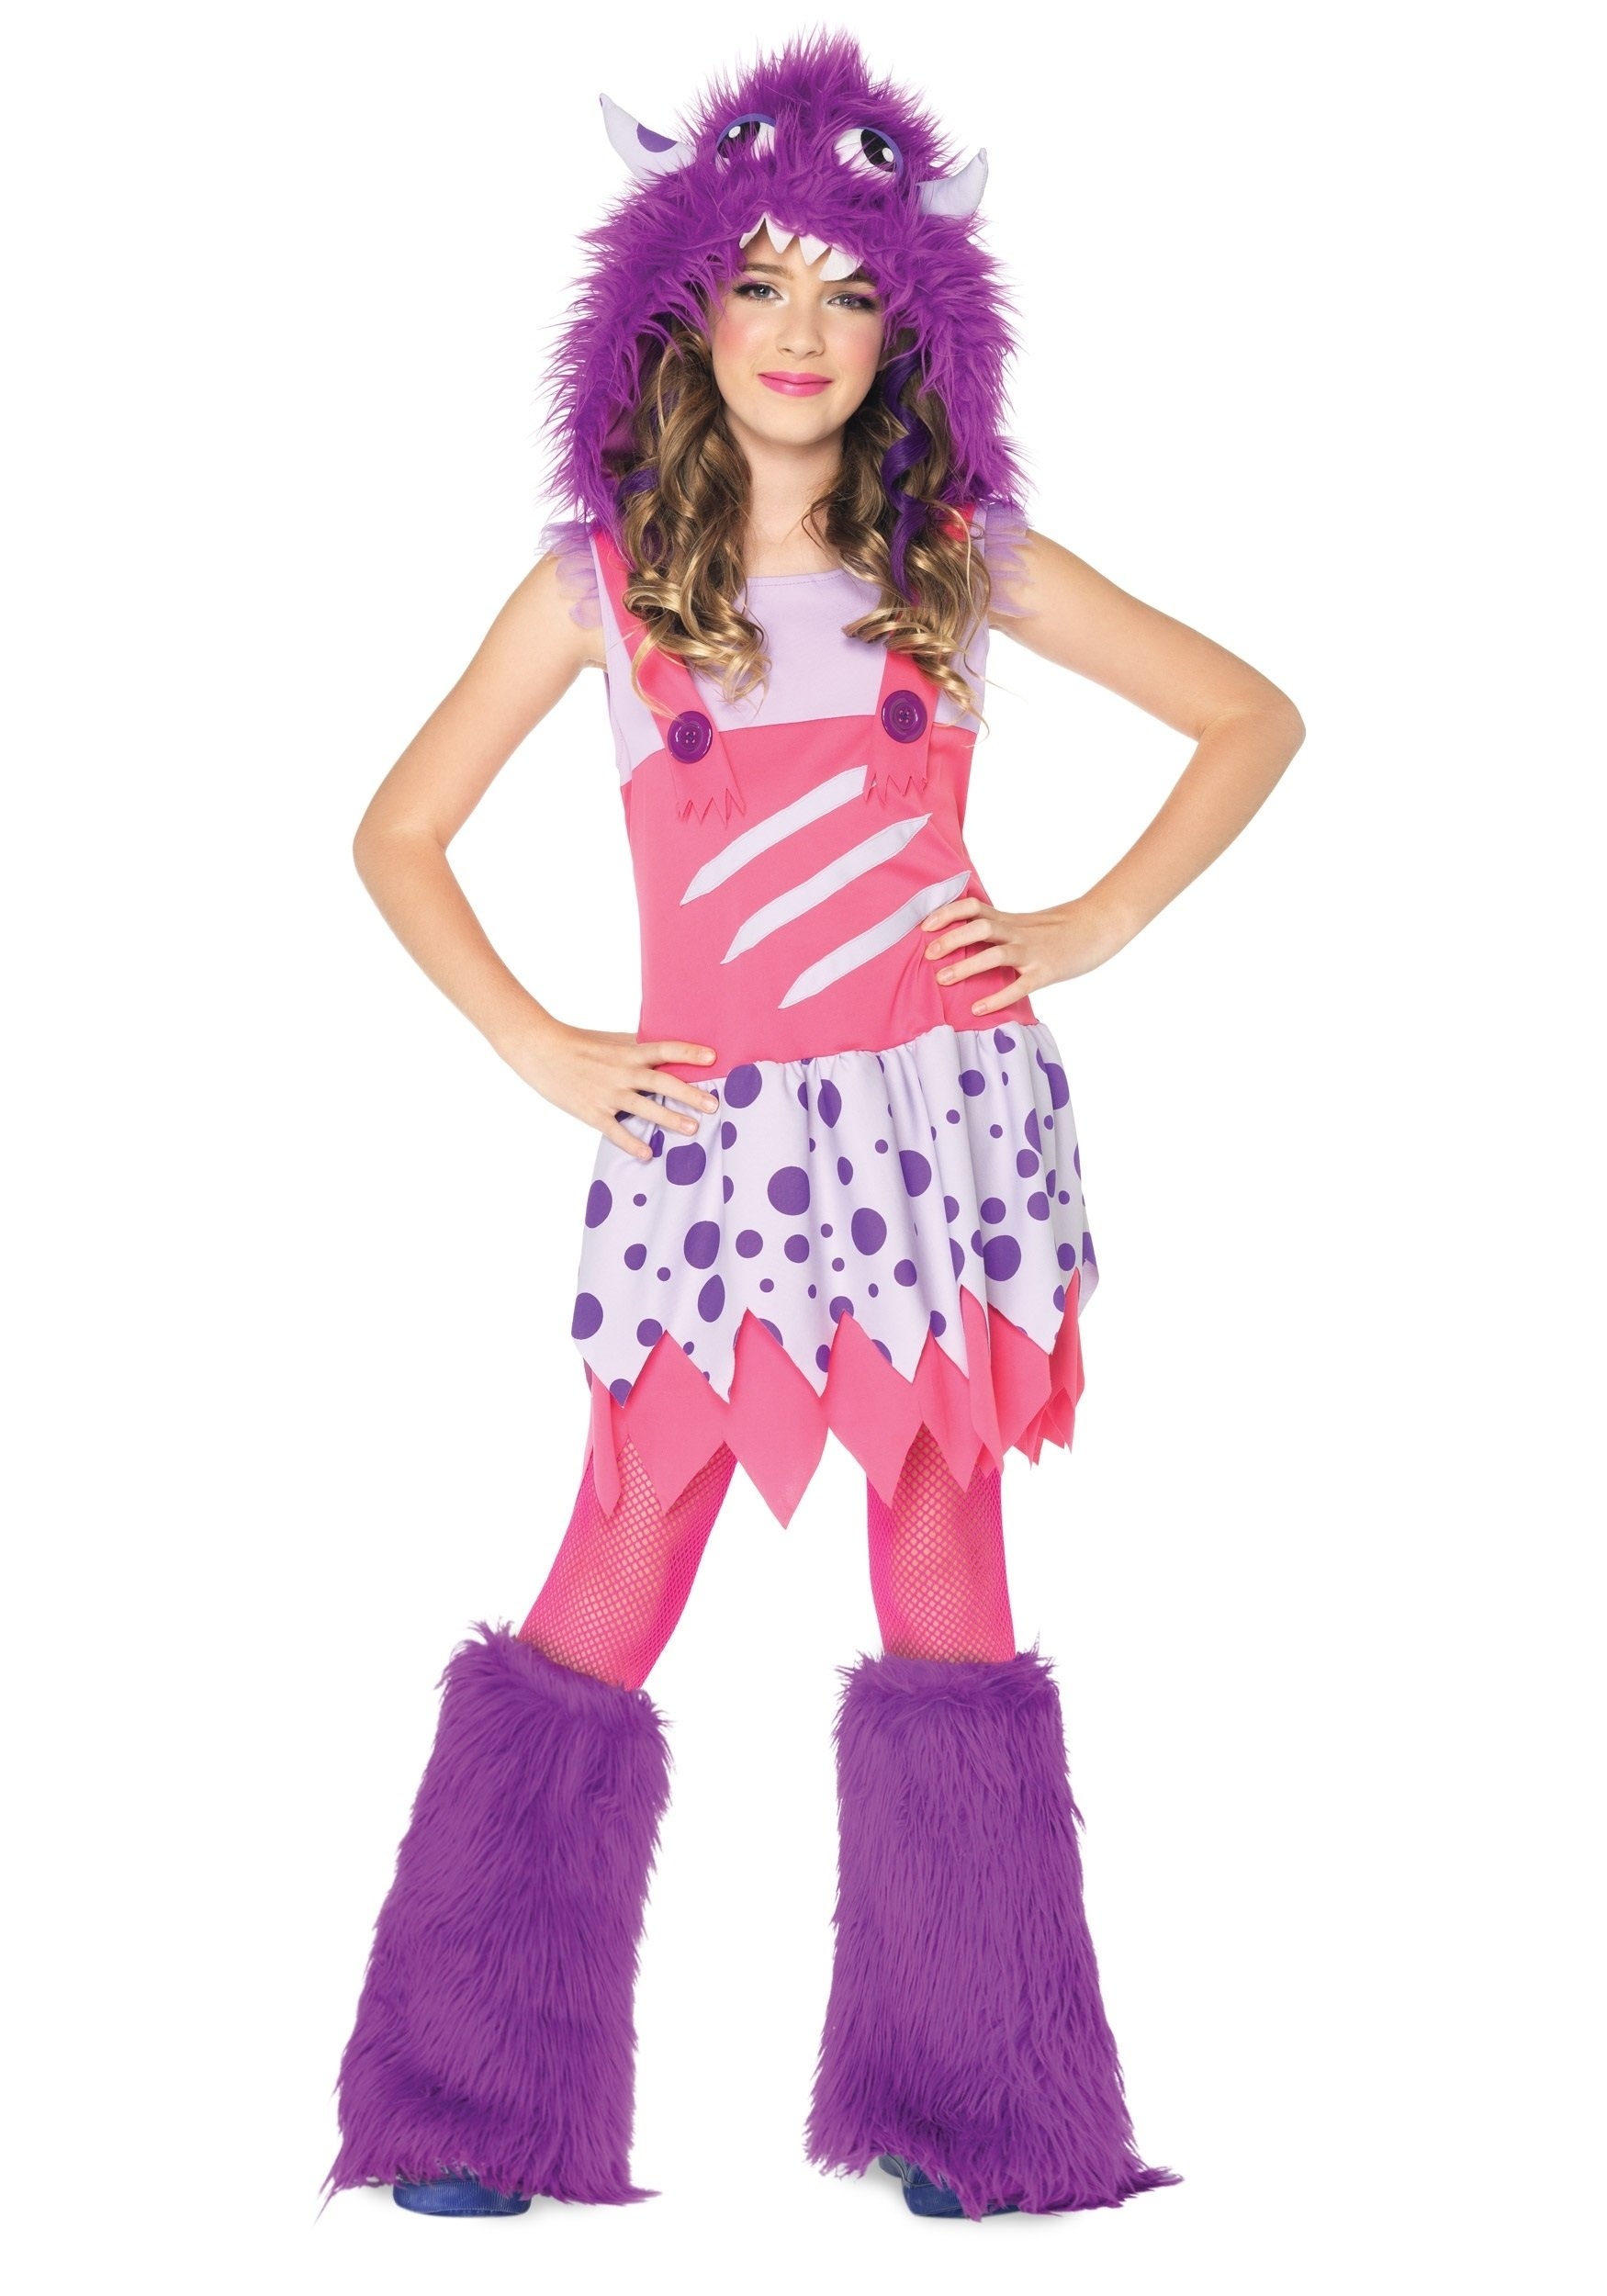 10 Wonderful Cool Halloween Costume Ideas For Girls girls furball monster costume halloween costume ideas 2016 2 2020